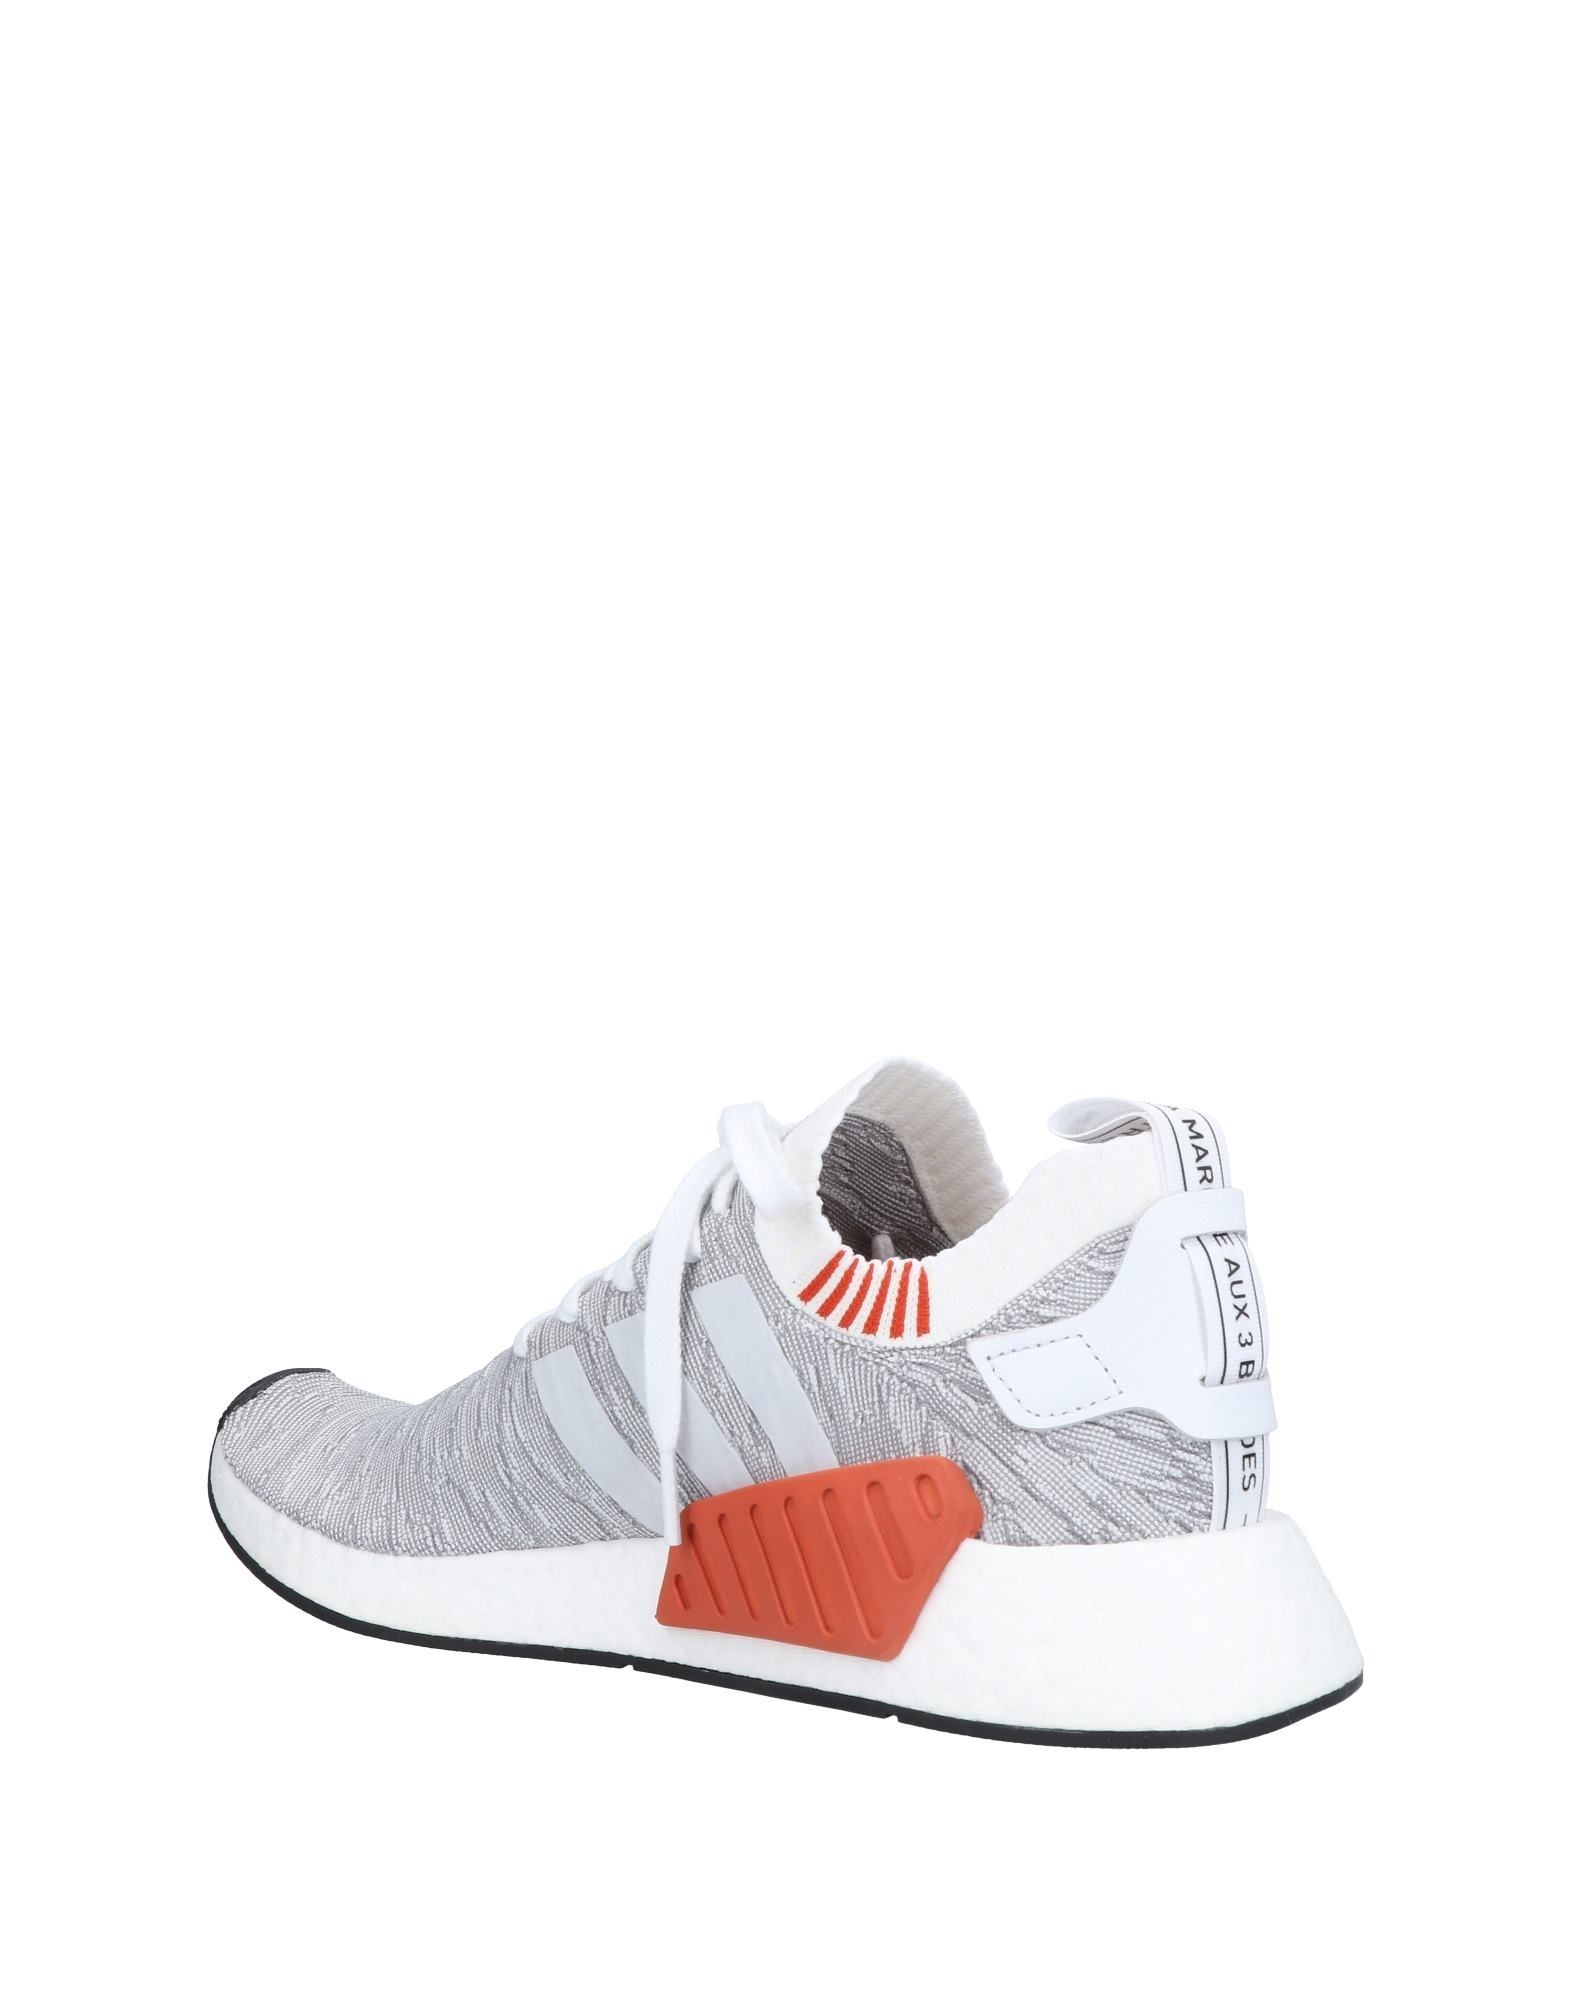 Sneakers Adidas Uomo - 11466117PB elegante elegante 11466117PB 8a7a5d